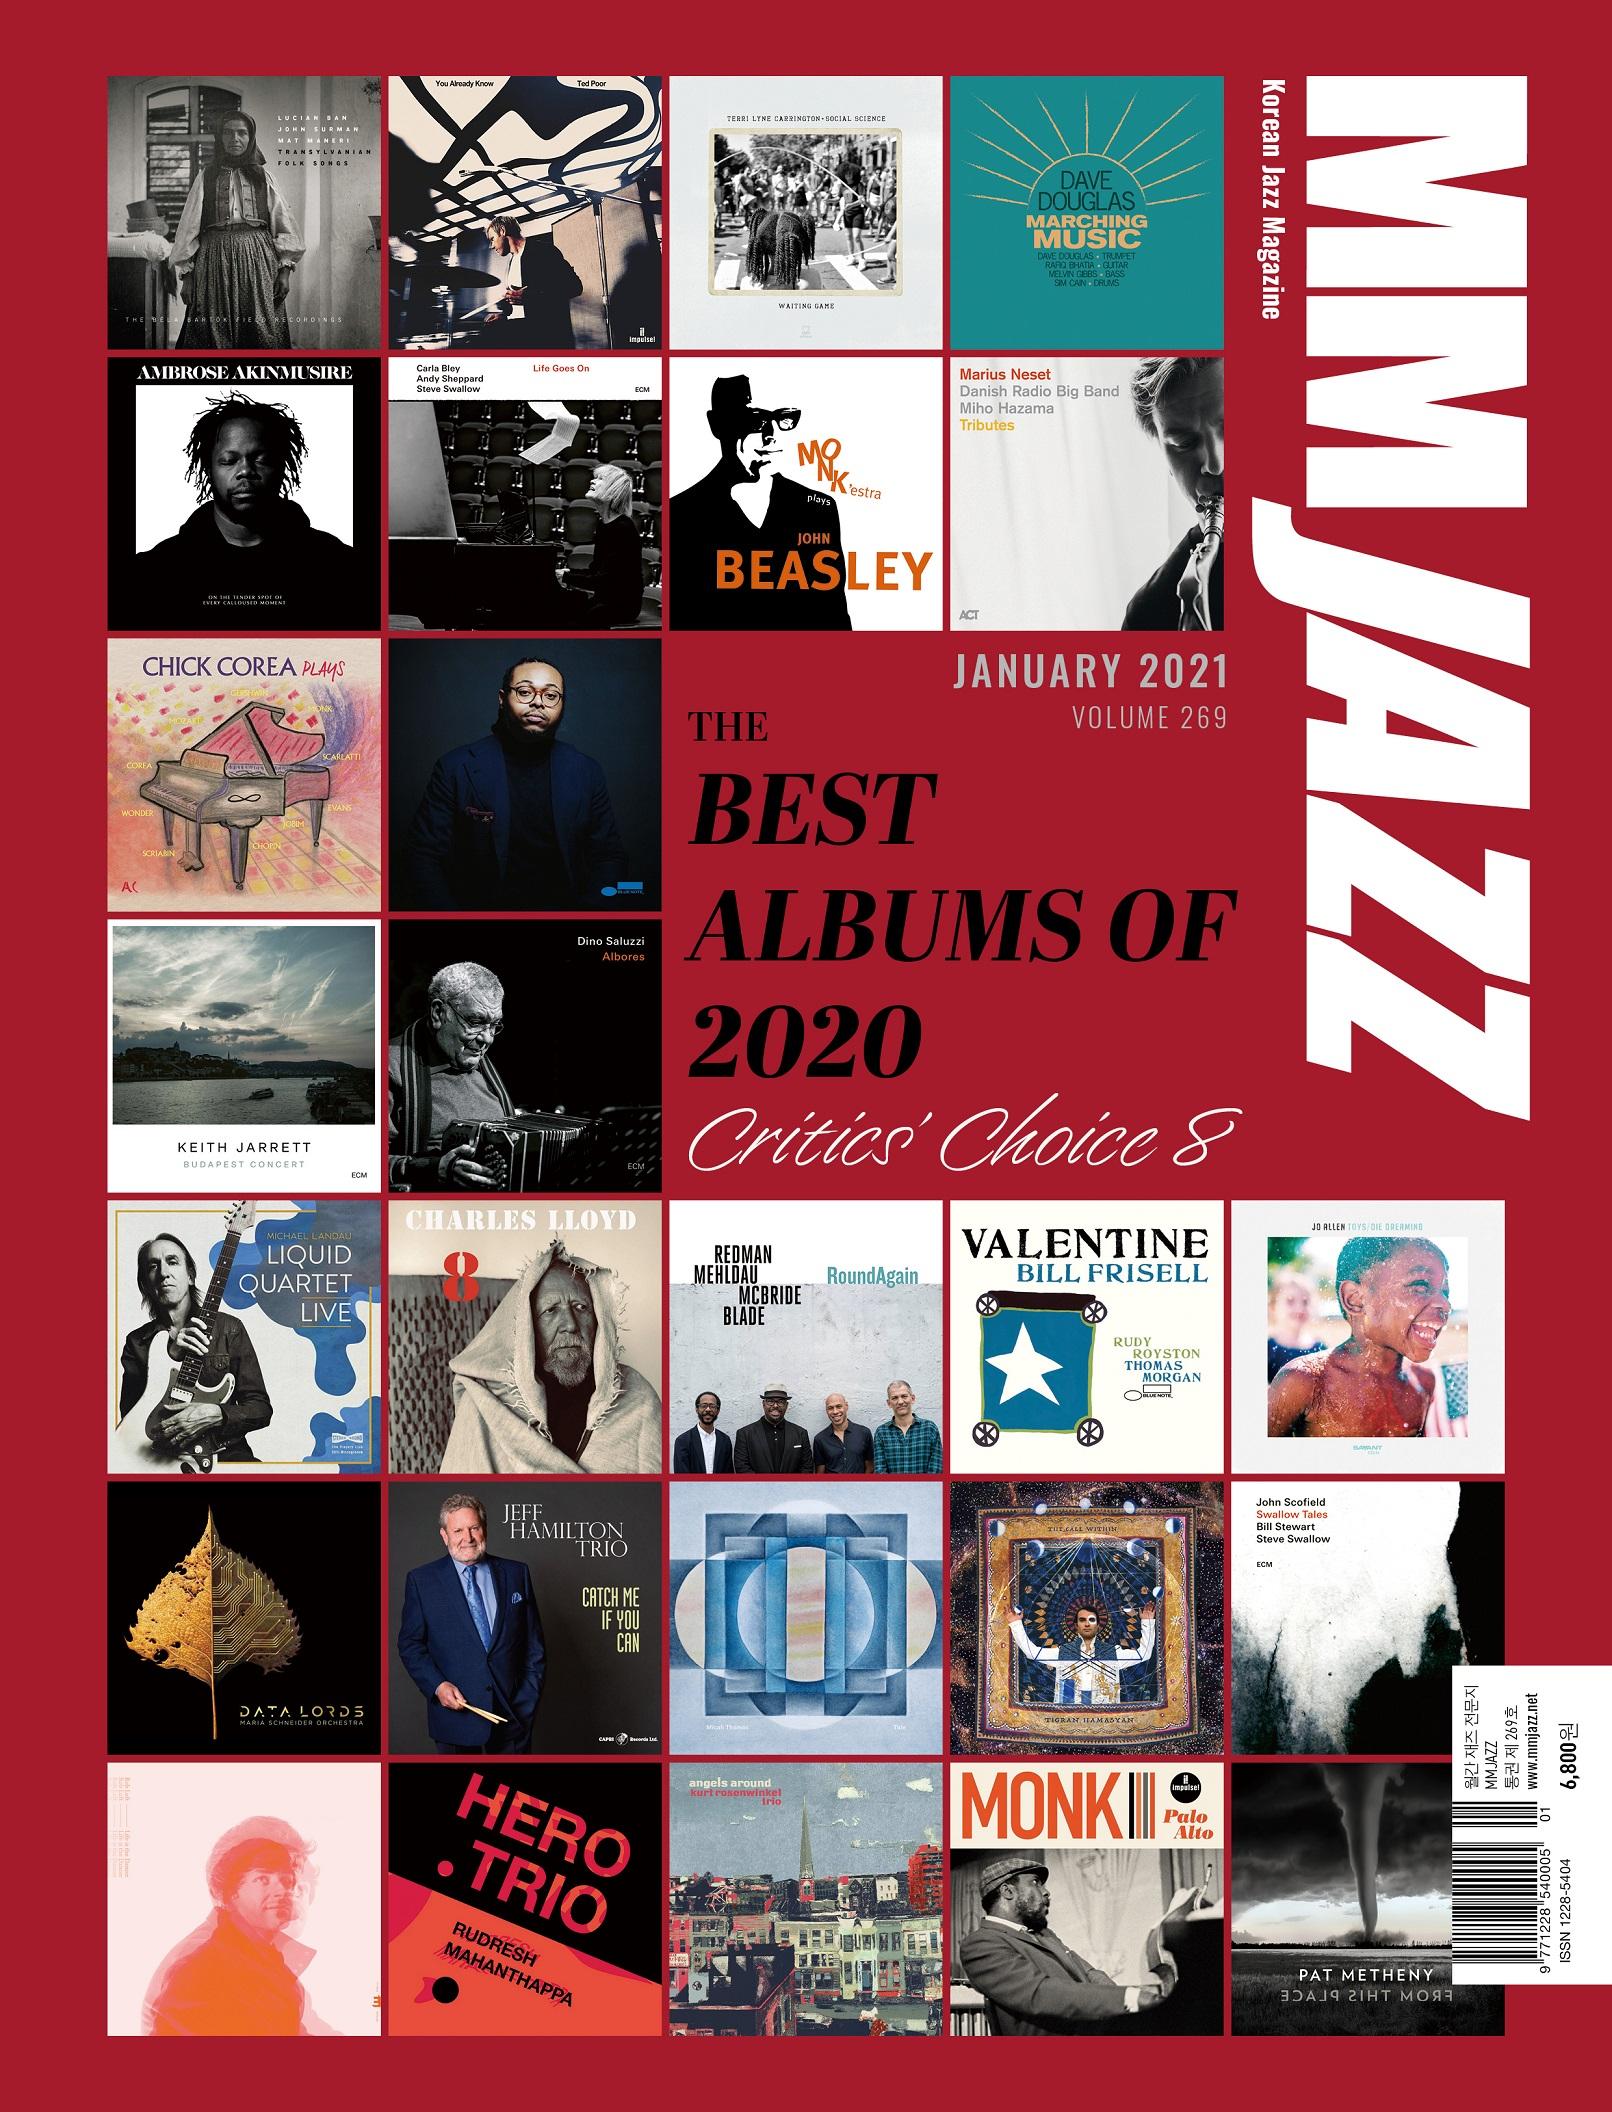 MMjazz_vol269_cover1.jpg